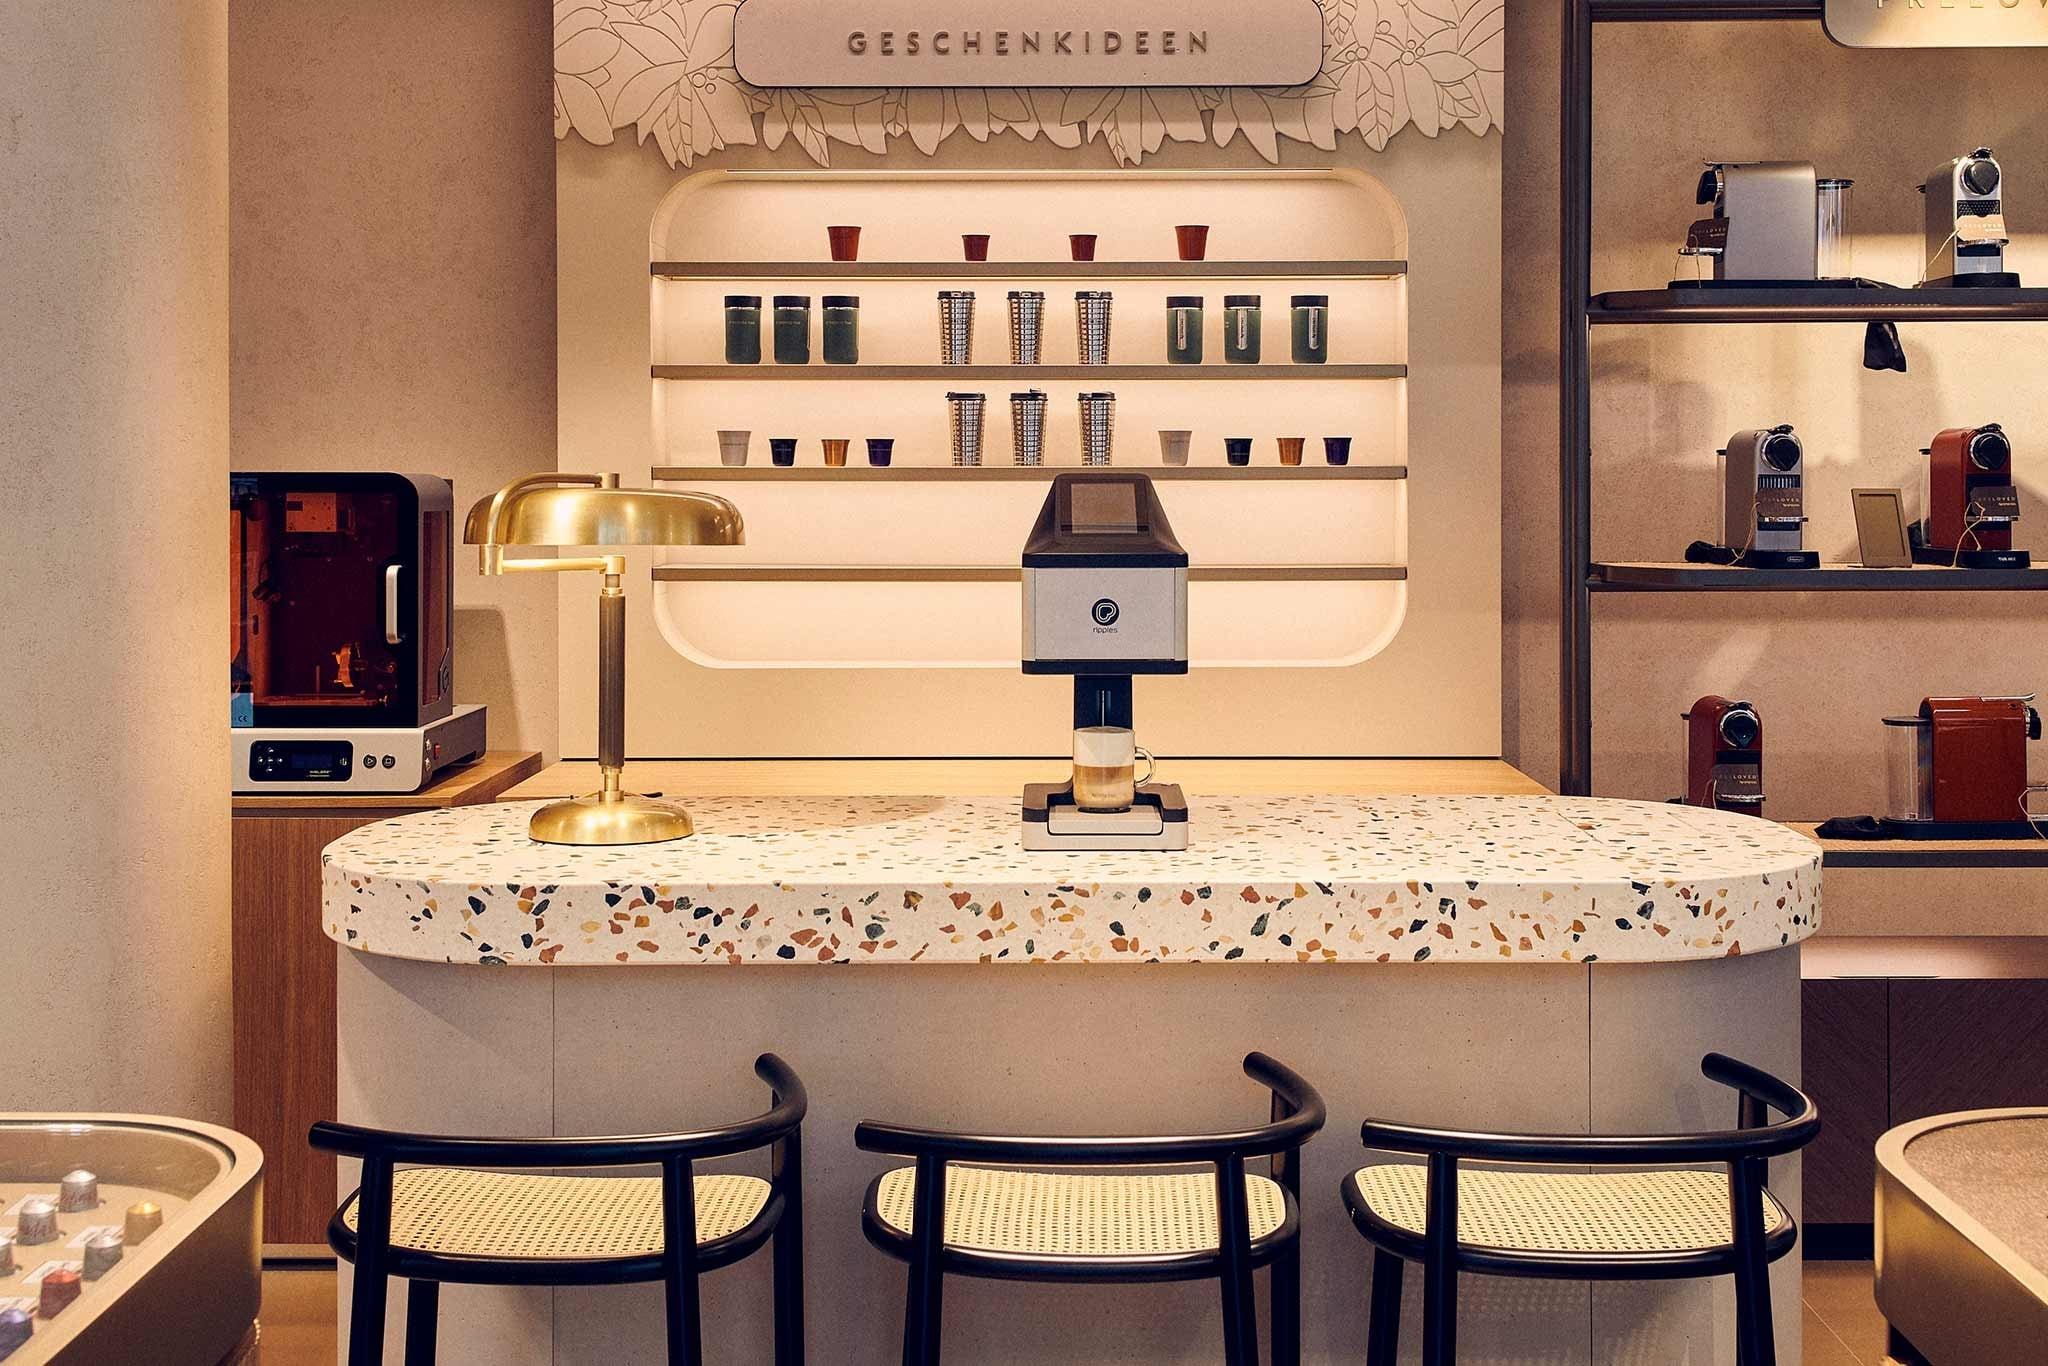 Nespresso experiential concept store in Vienna